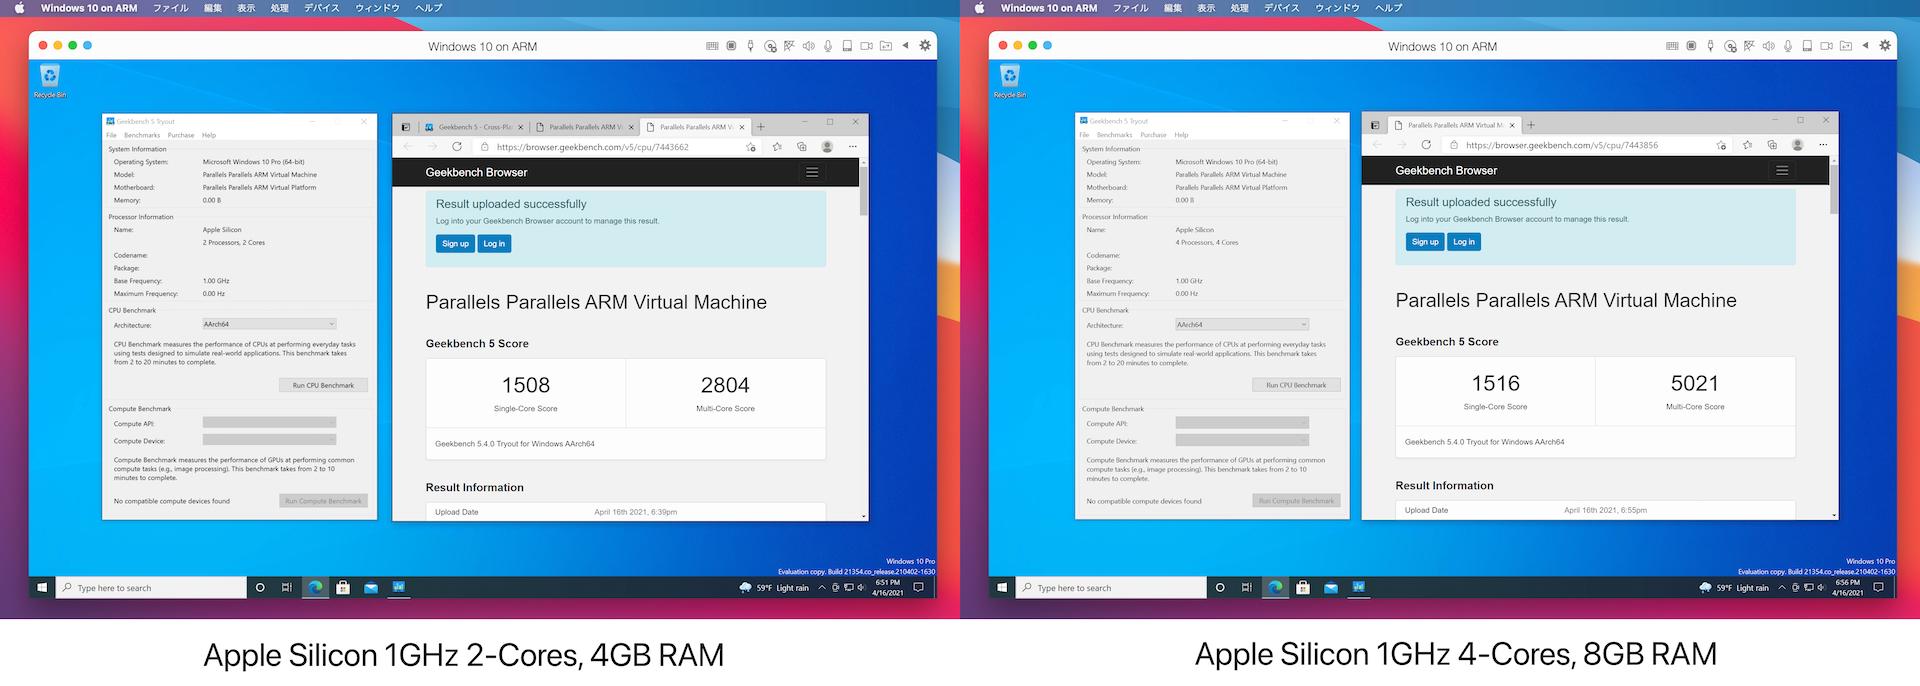 Parallels Desktop v16.5 for MacでのWindows 10 on ARMのベンチマーク